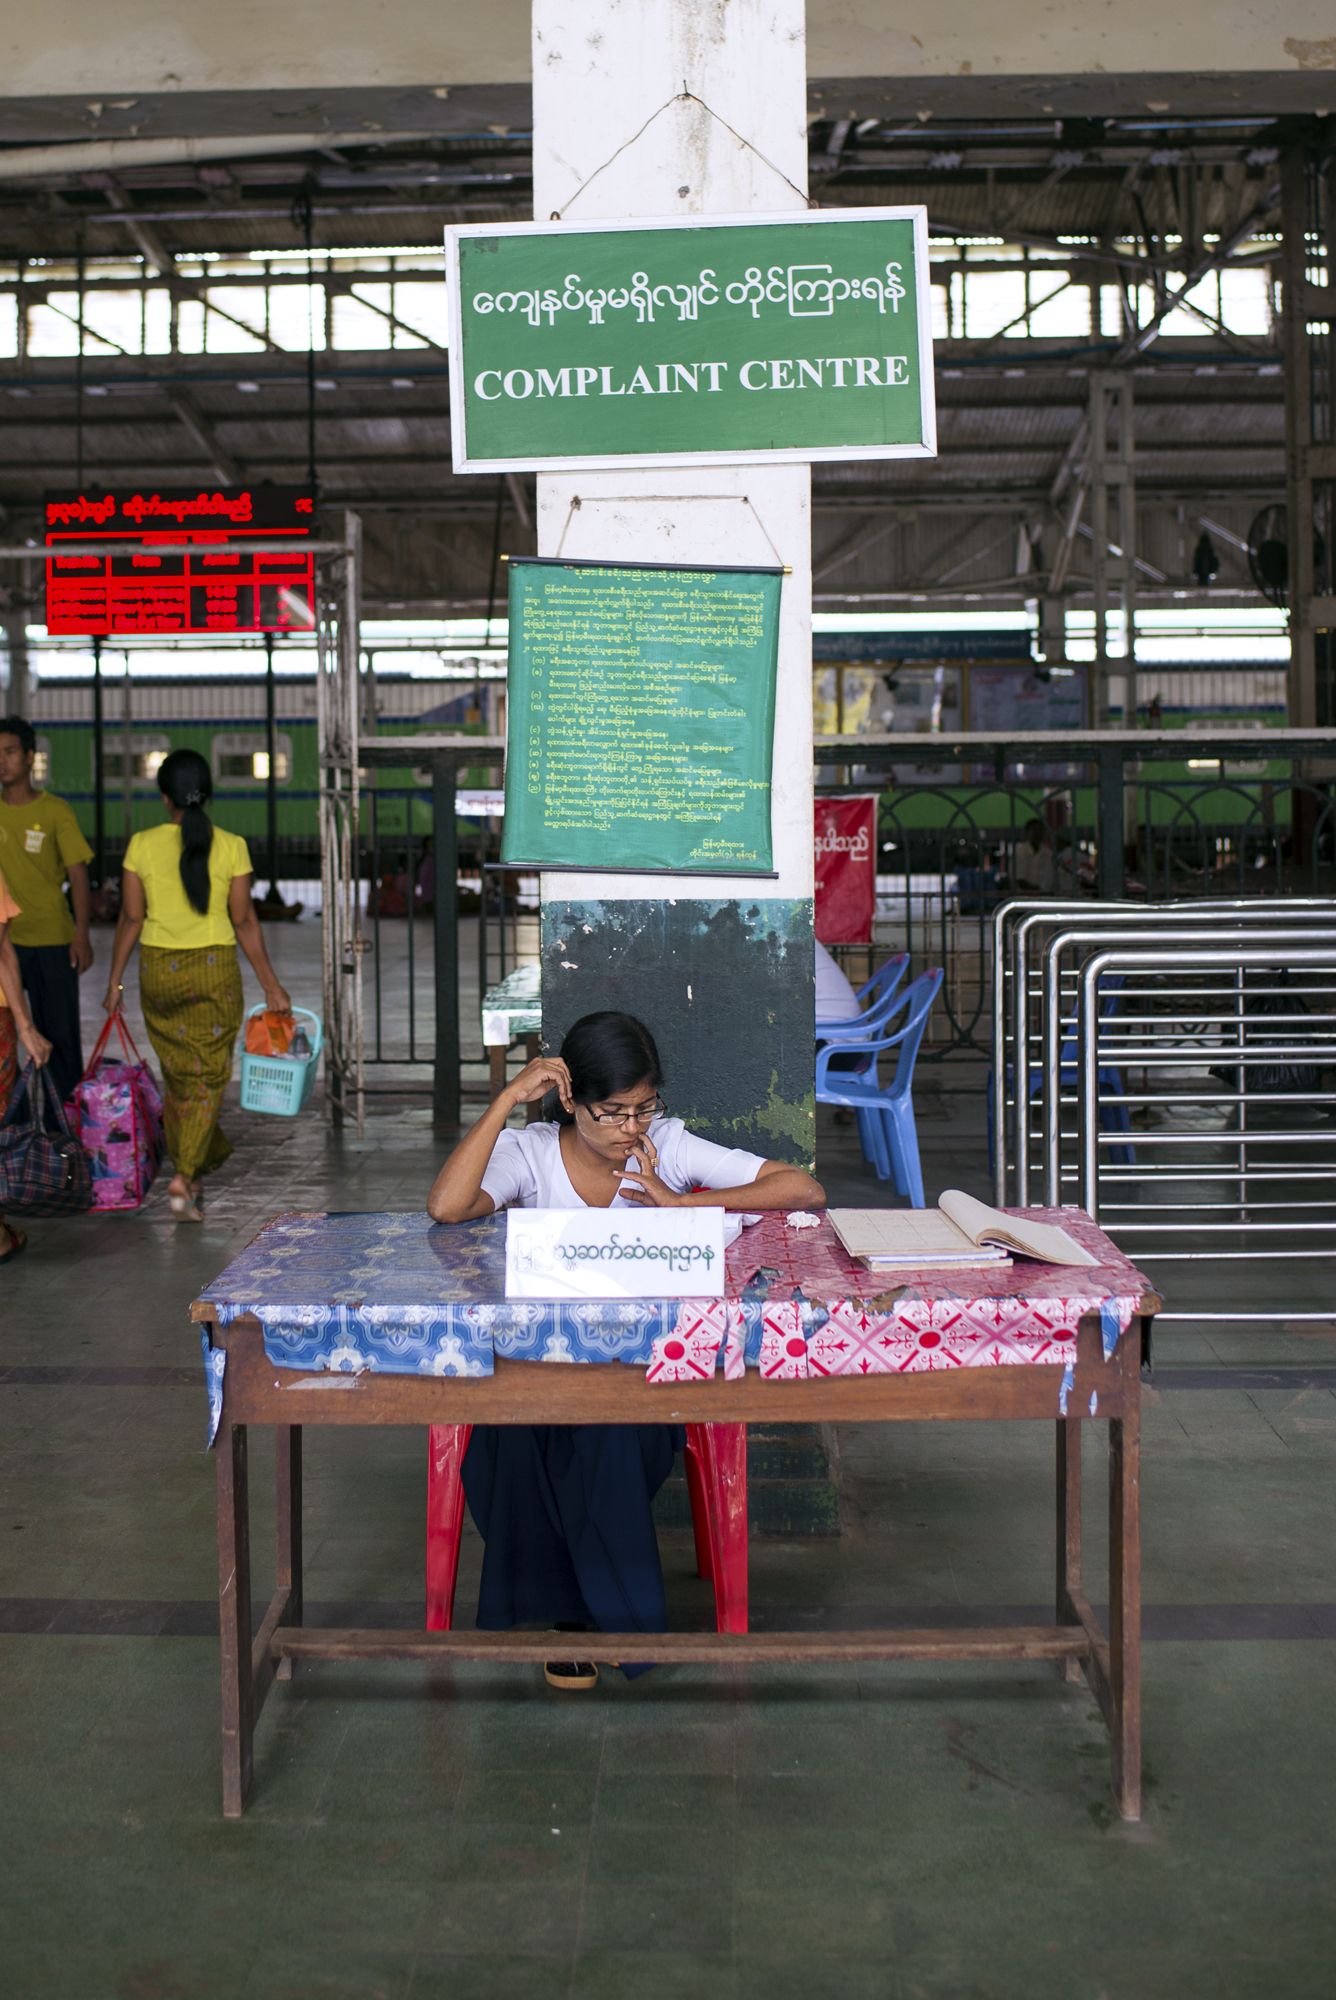 Yangon Central Station